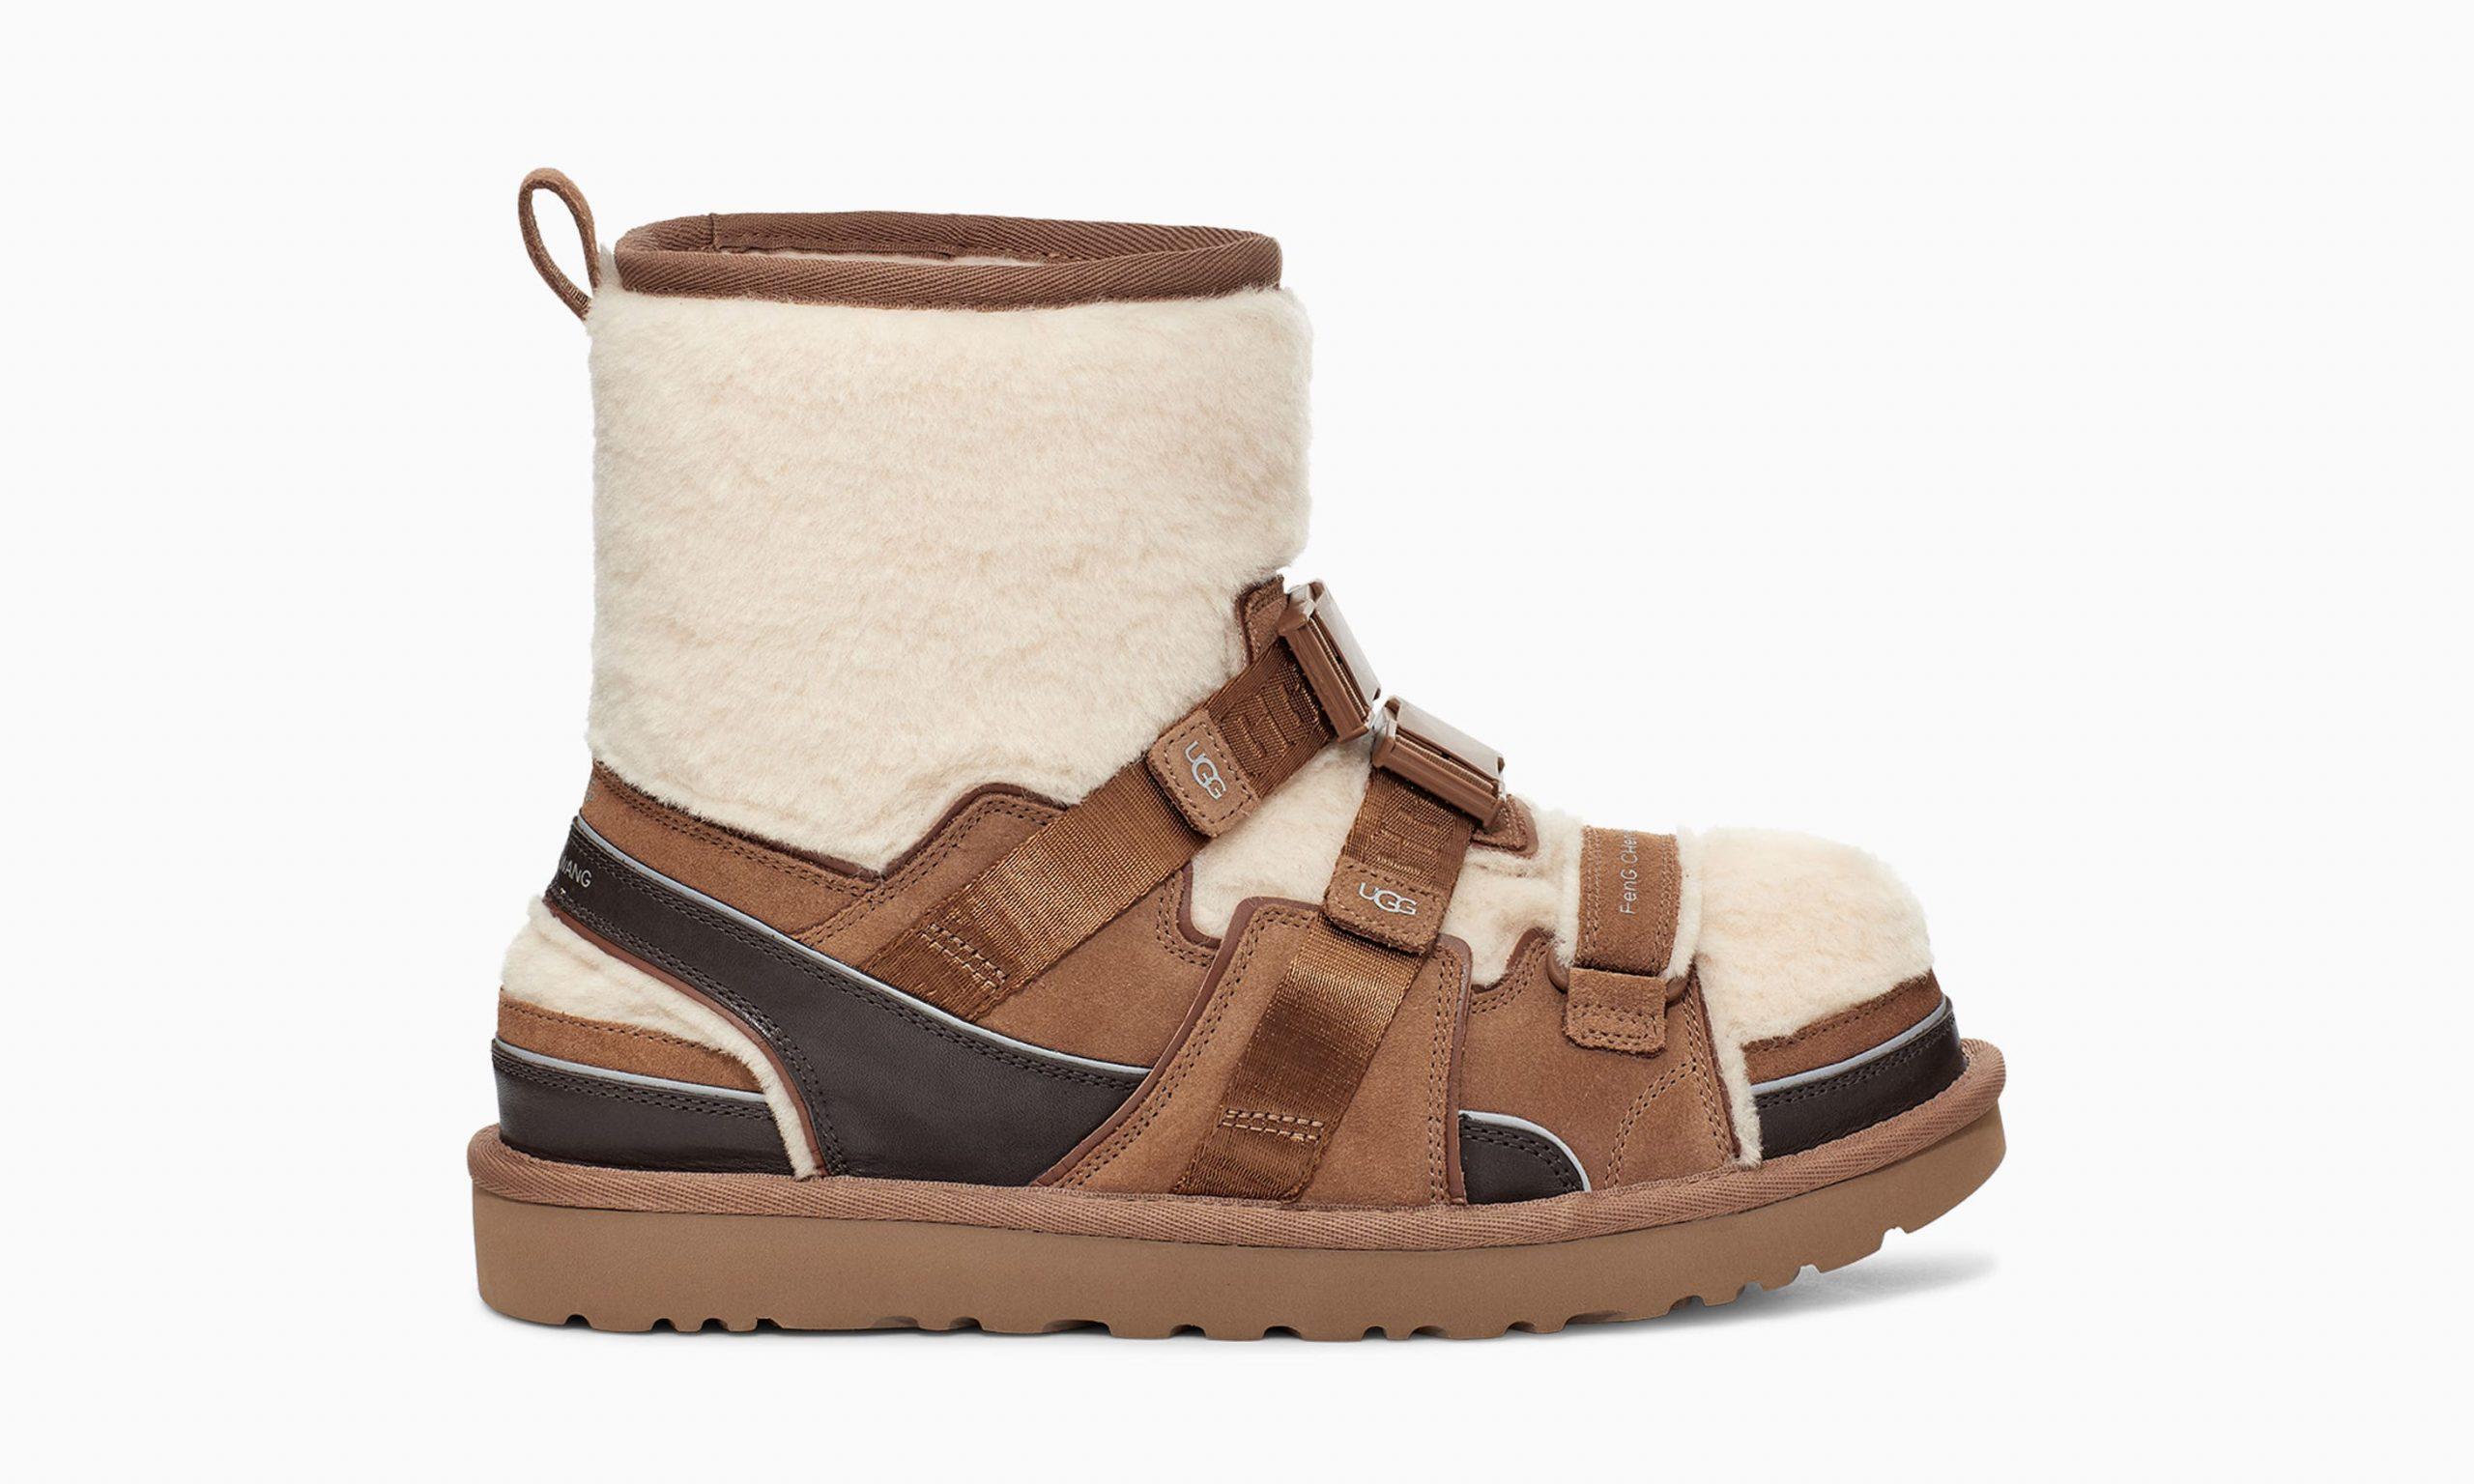 Feng Chen Wang  x UGG 联名鞋款开启预售